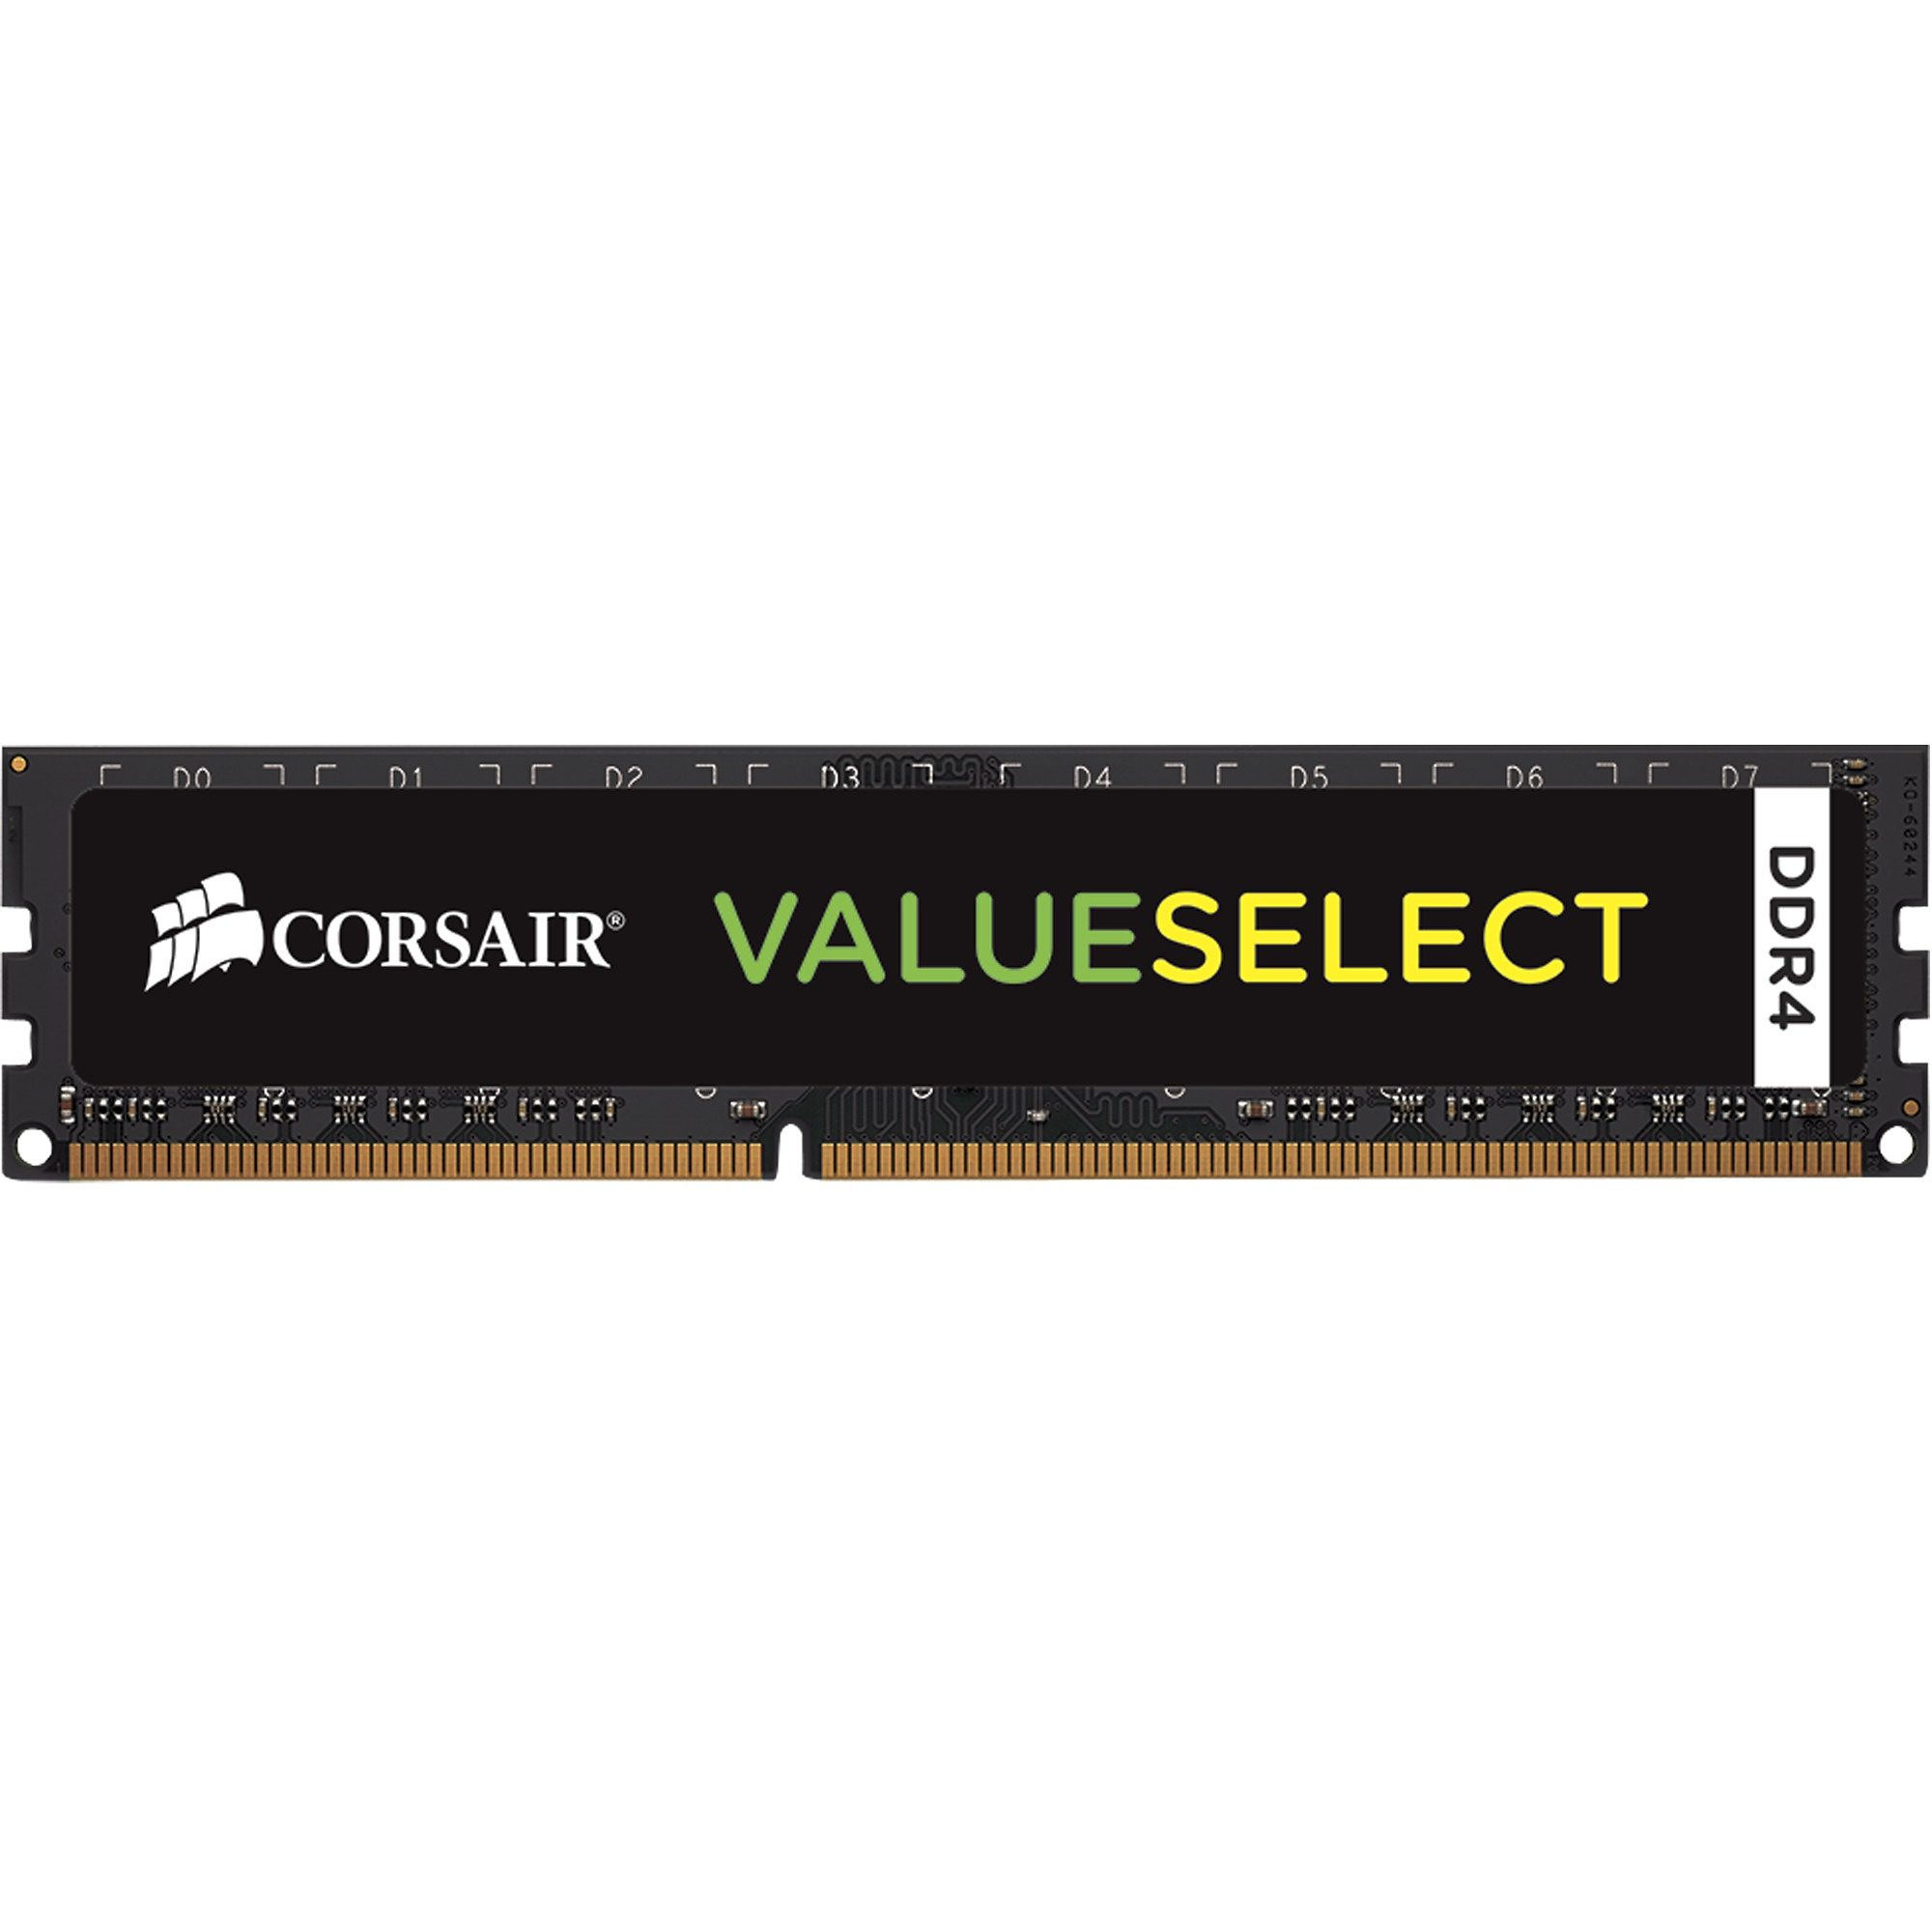 Corsair ValueSelect Arbeitsspeicher »DIMM 4 GB DDR4-2133«